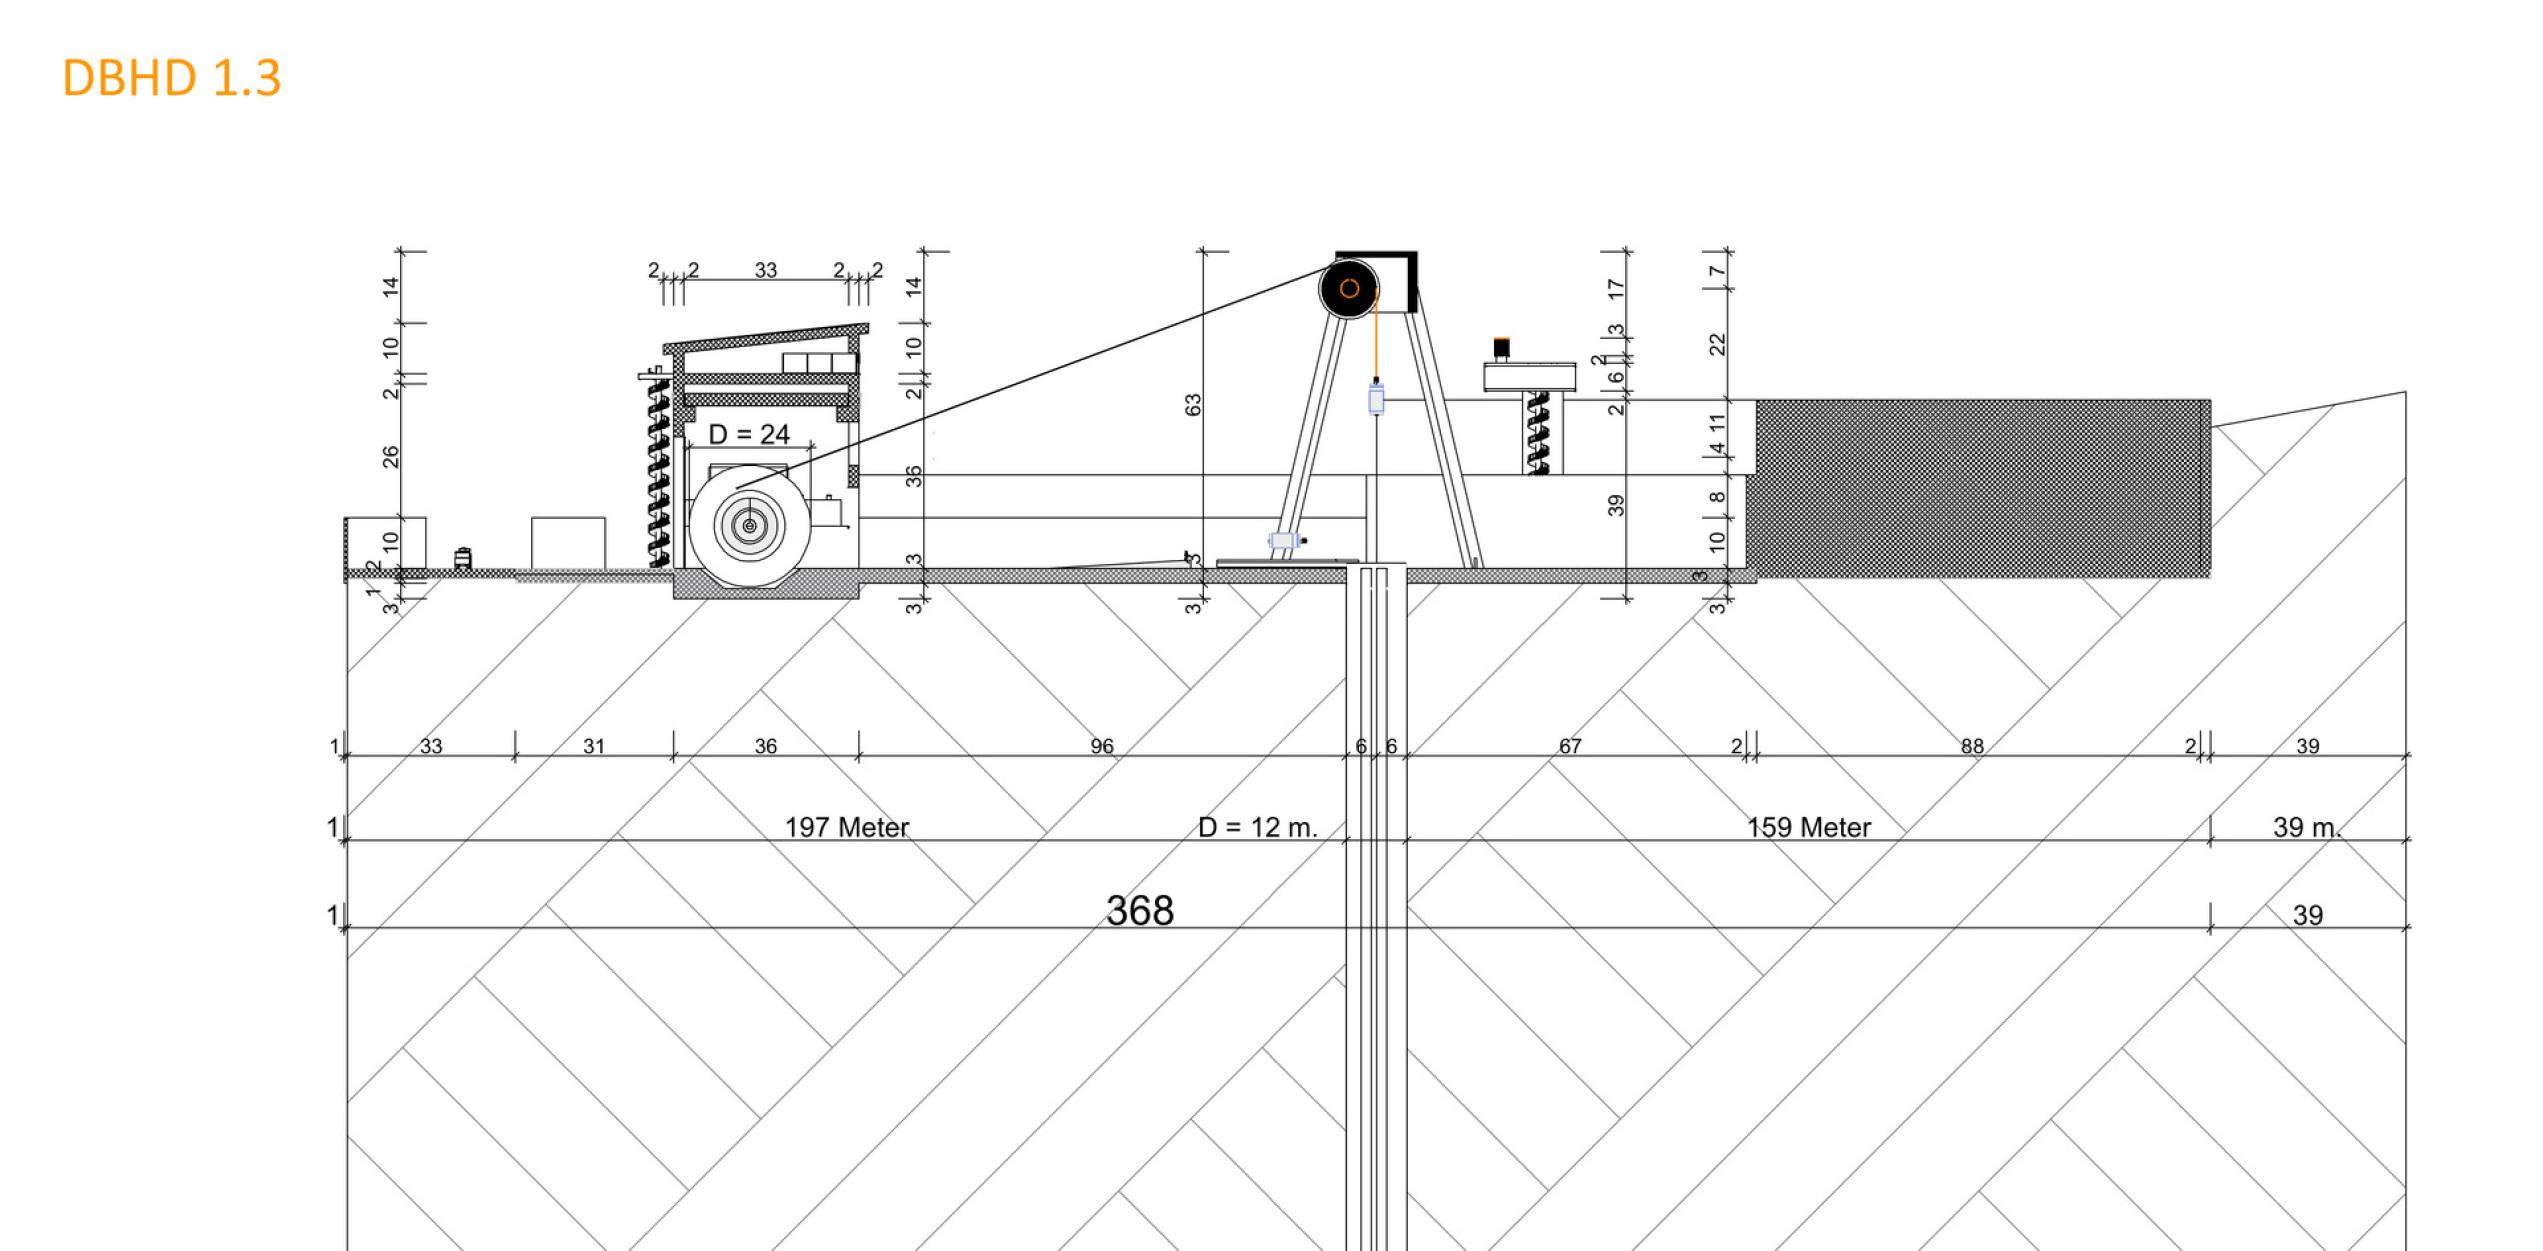 DBHD_1.3_Schnitt_2_Cut_Surface_Oberfläche_Endlager_M-V